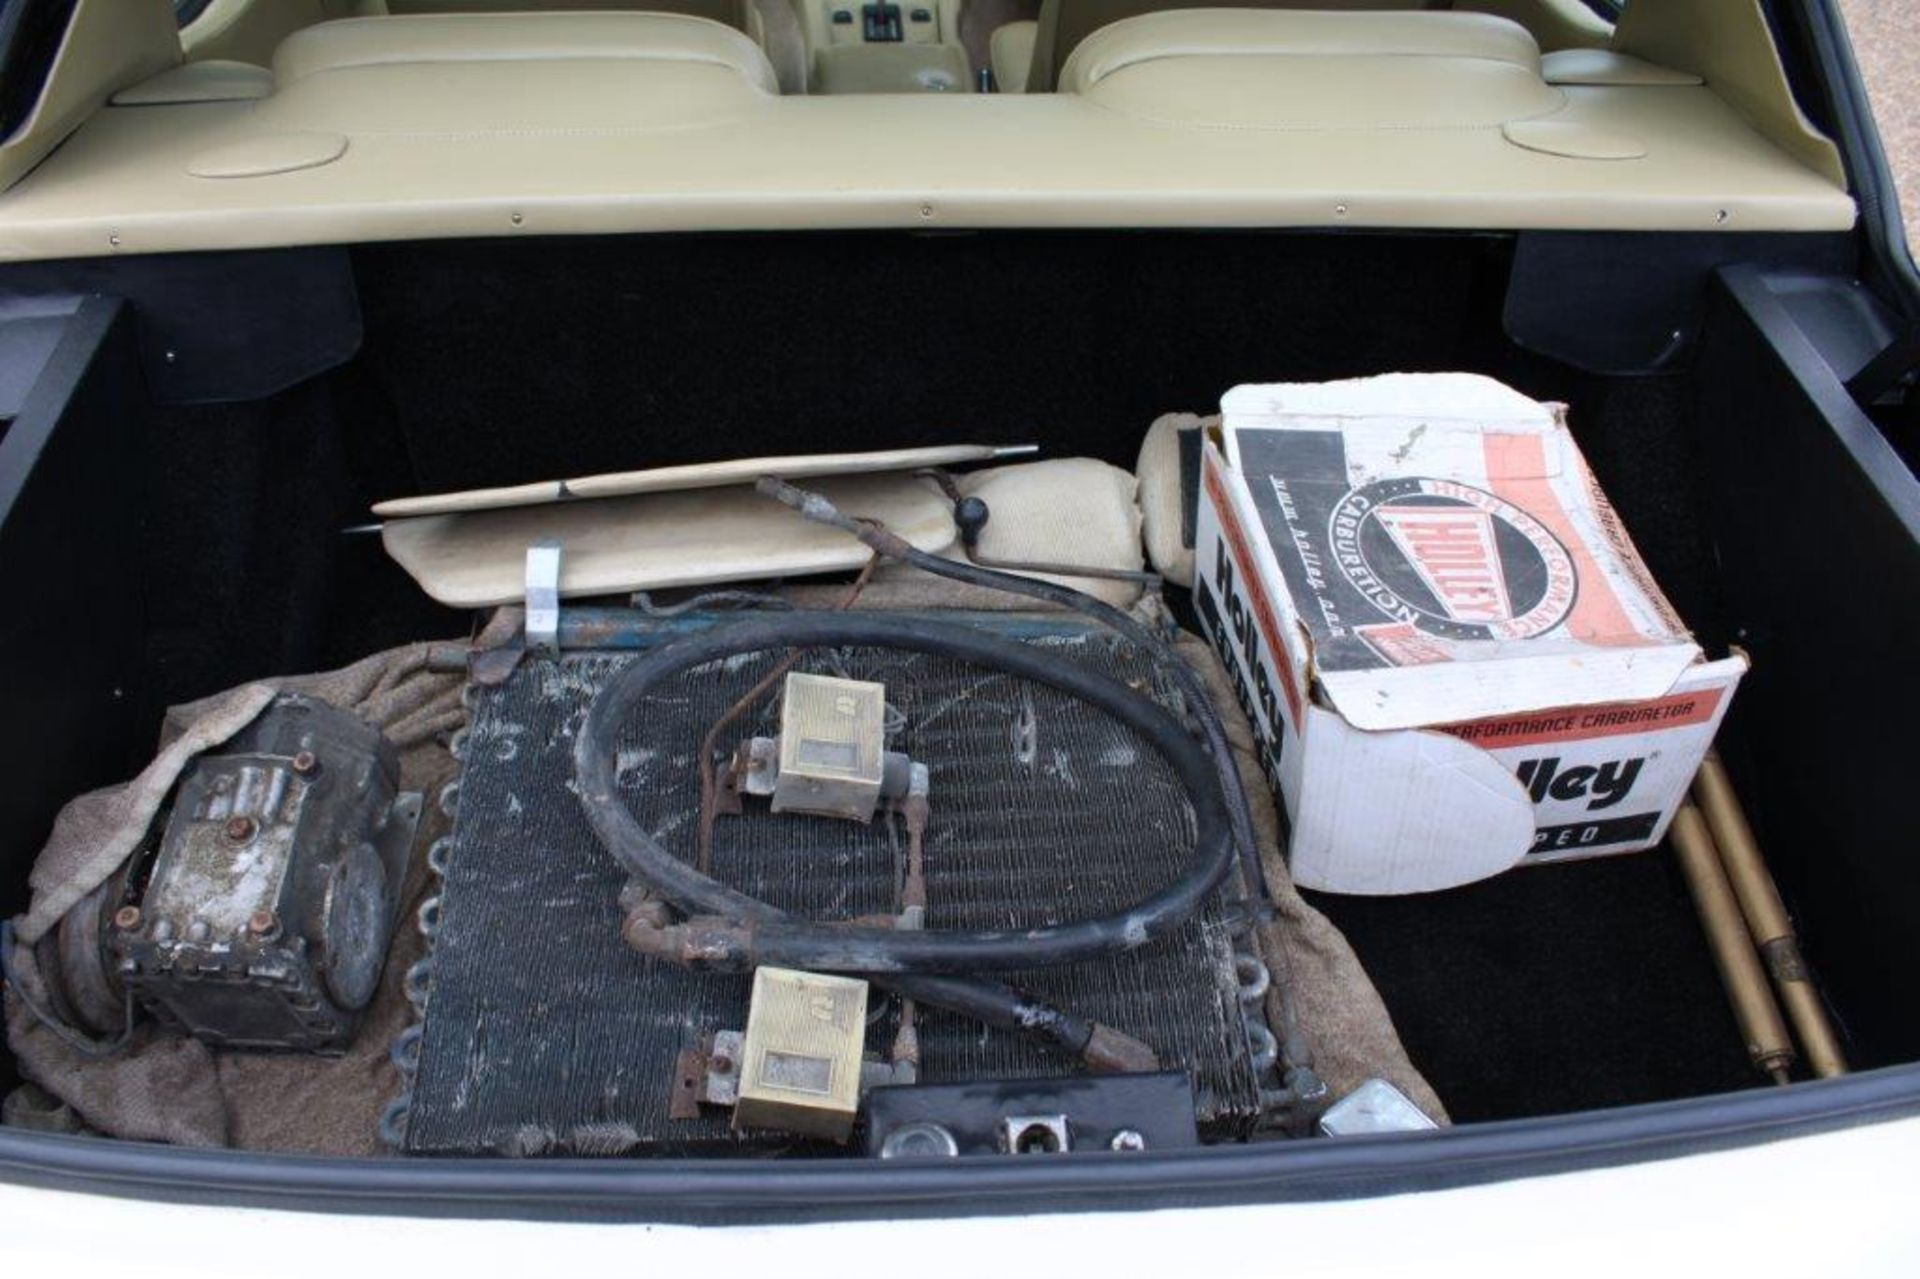 1972 Jensen Interceptor SP Auto - Image 14 of 32